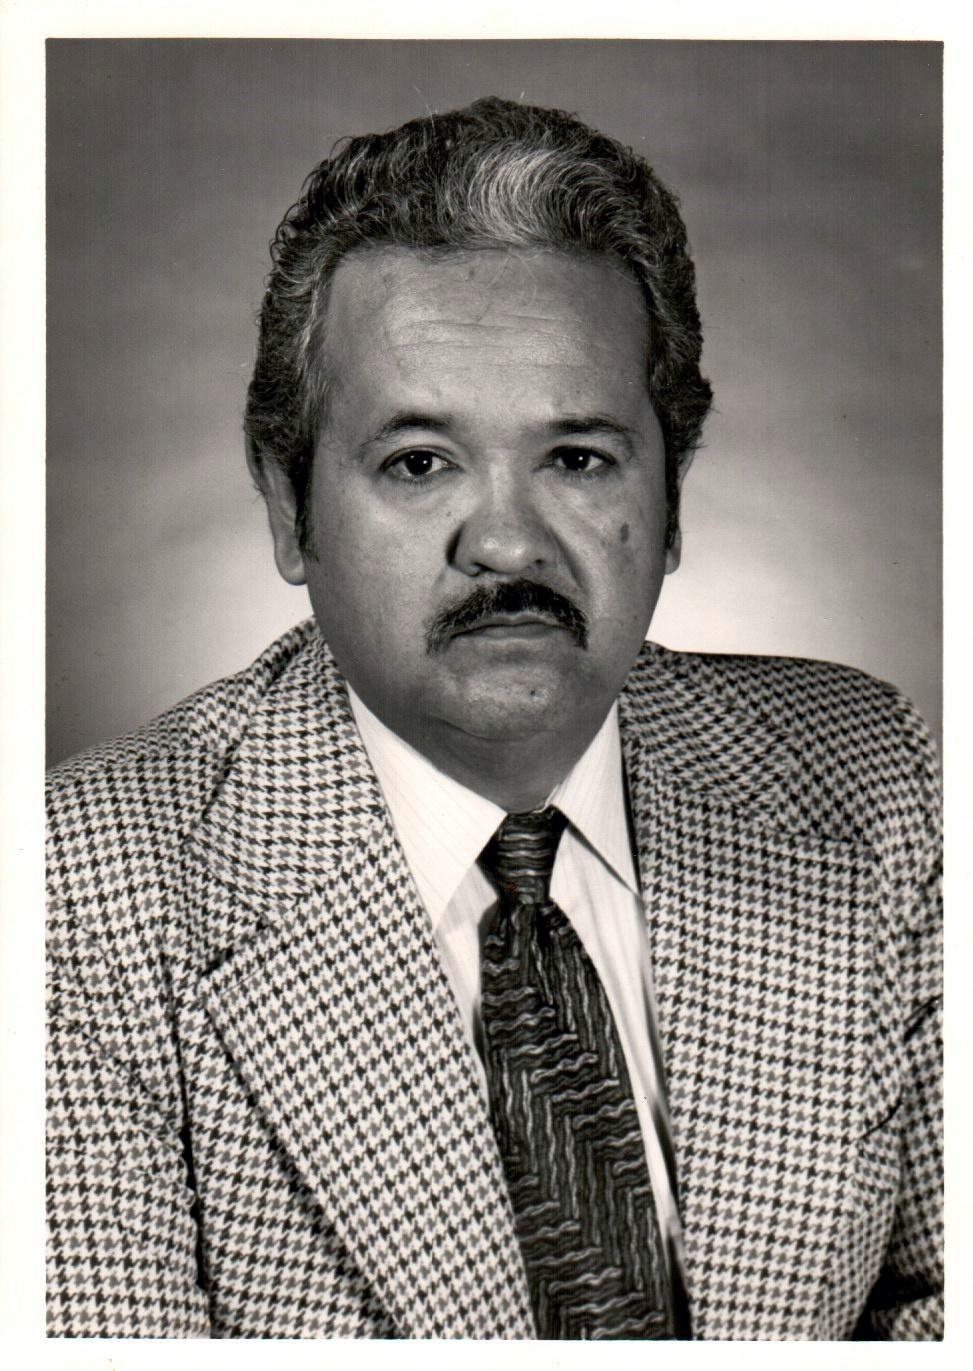 Rudy S.   Quintanilla